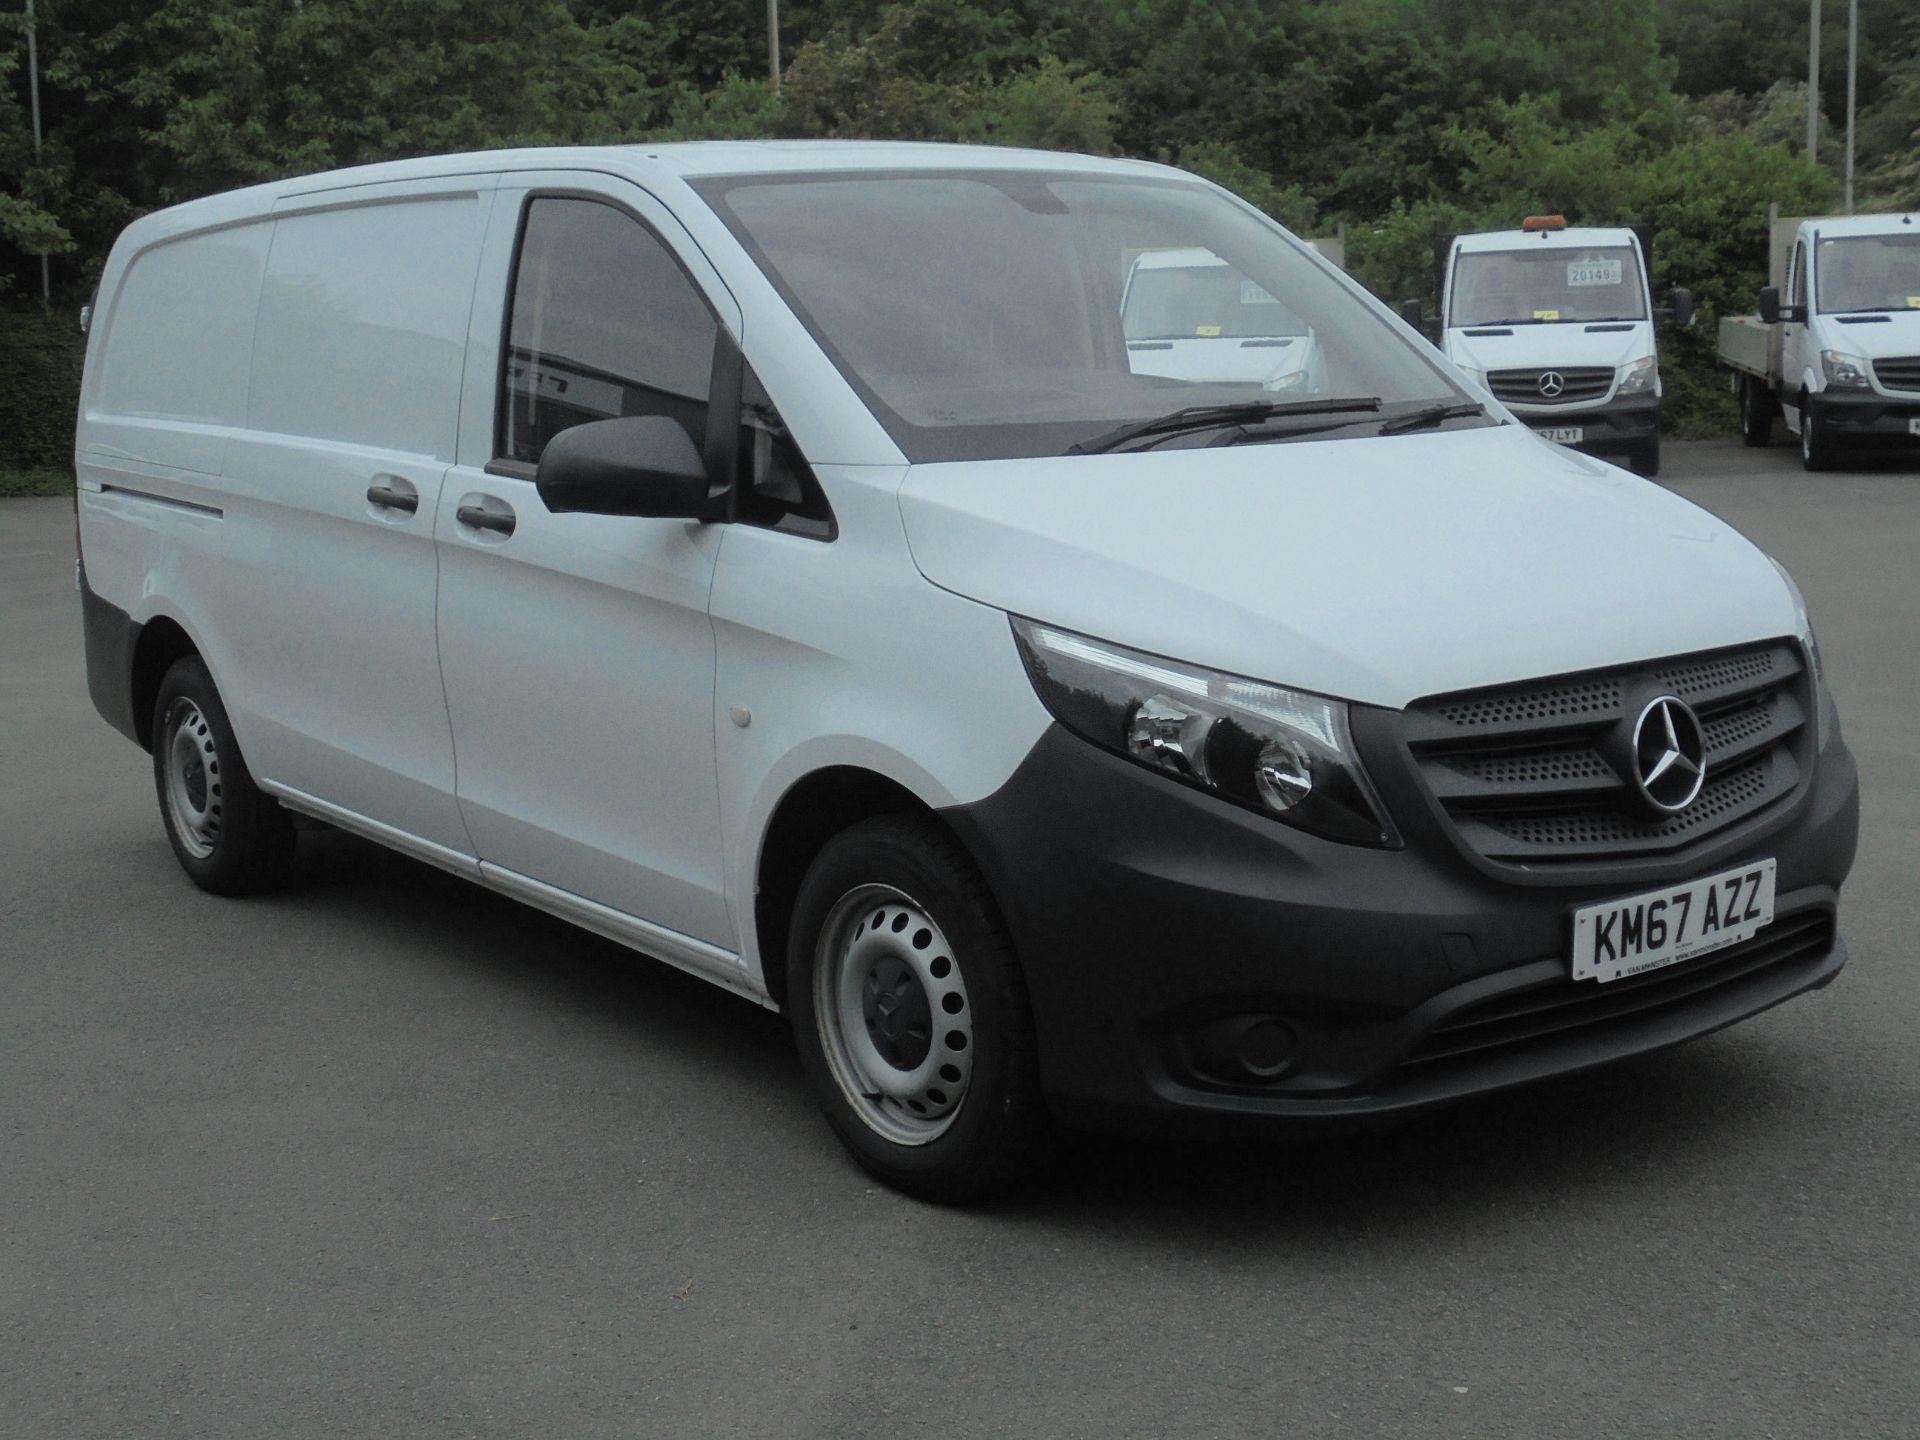 2017 Mercedes-Benz Vito 111Cdi Van (KM67AZZ) Image 1